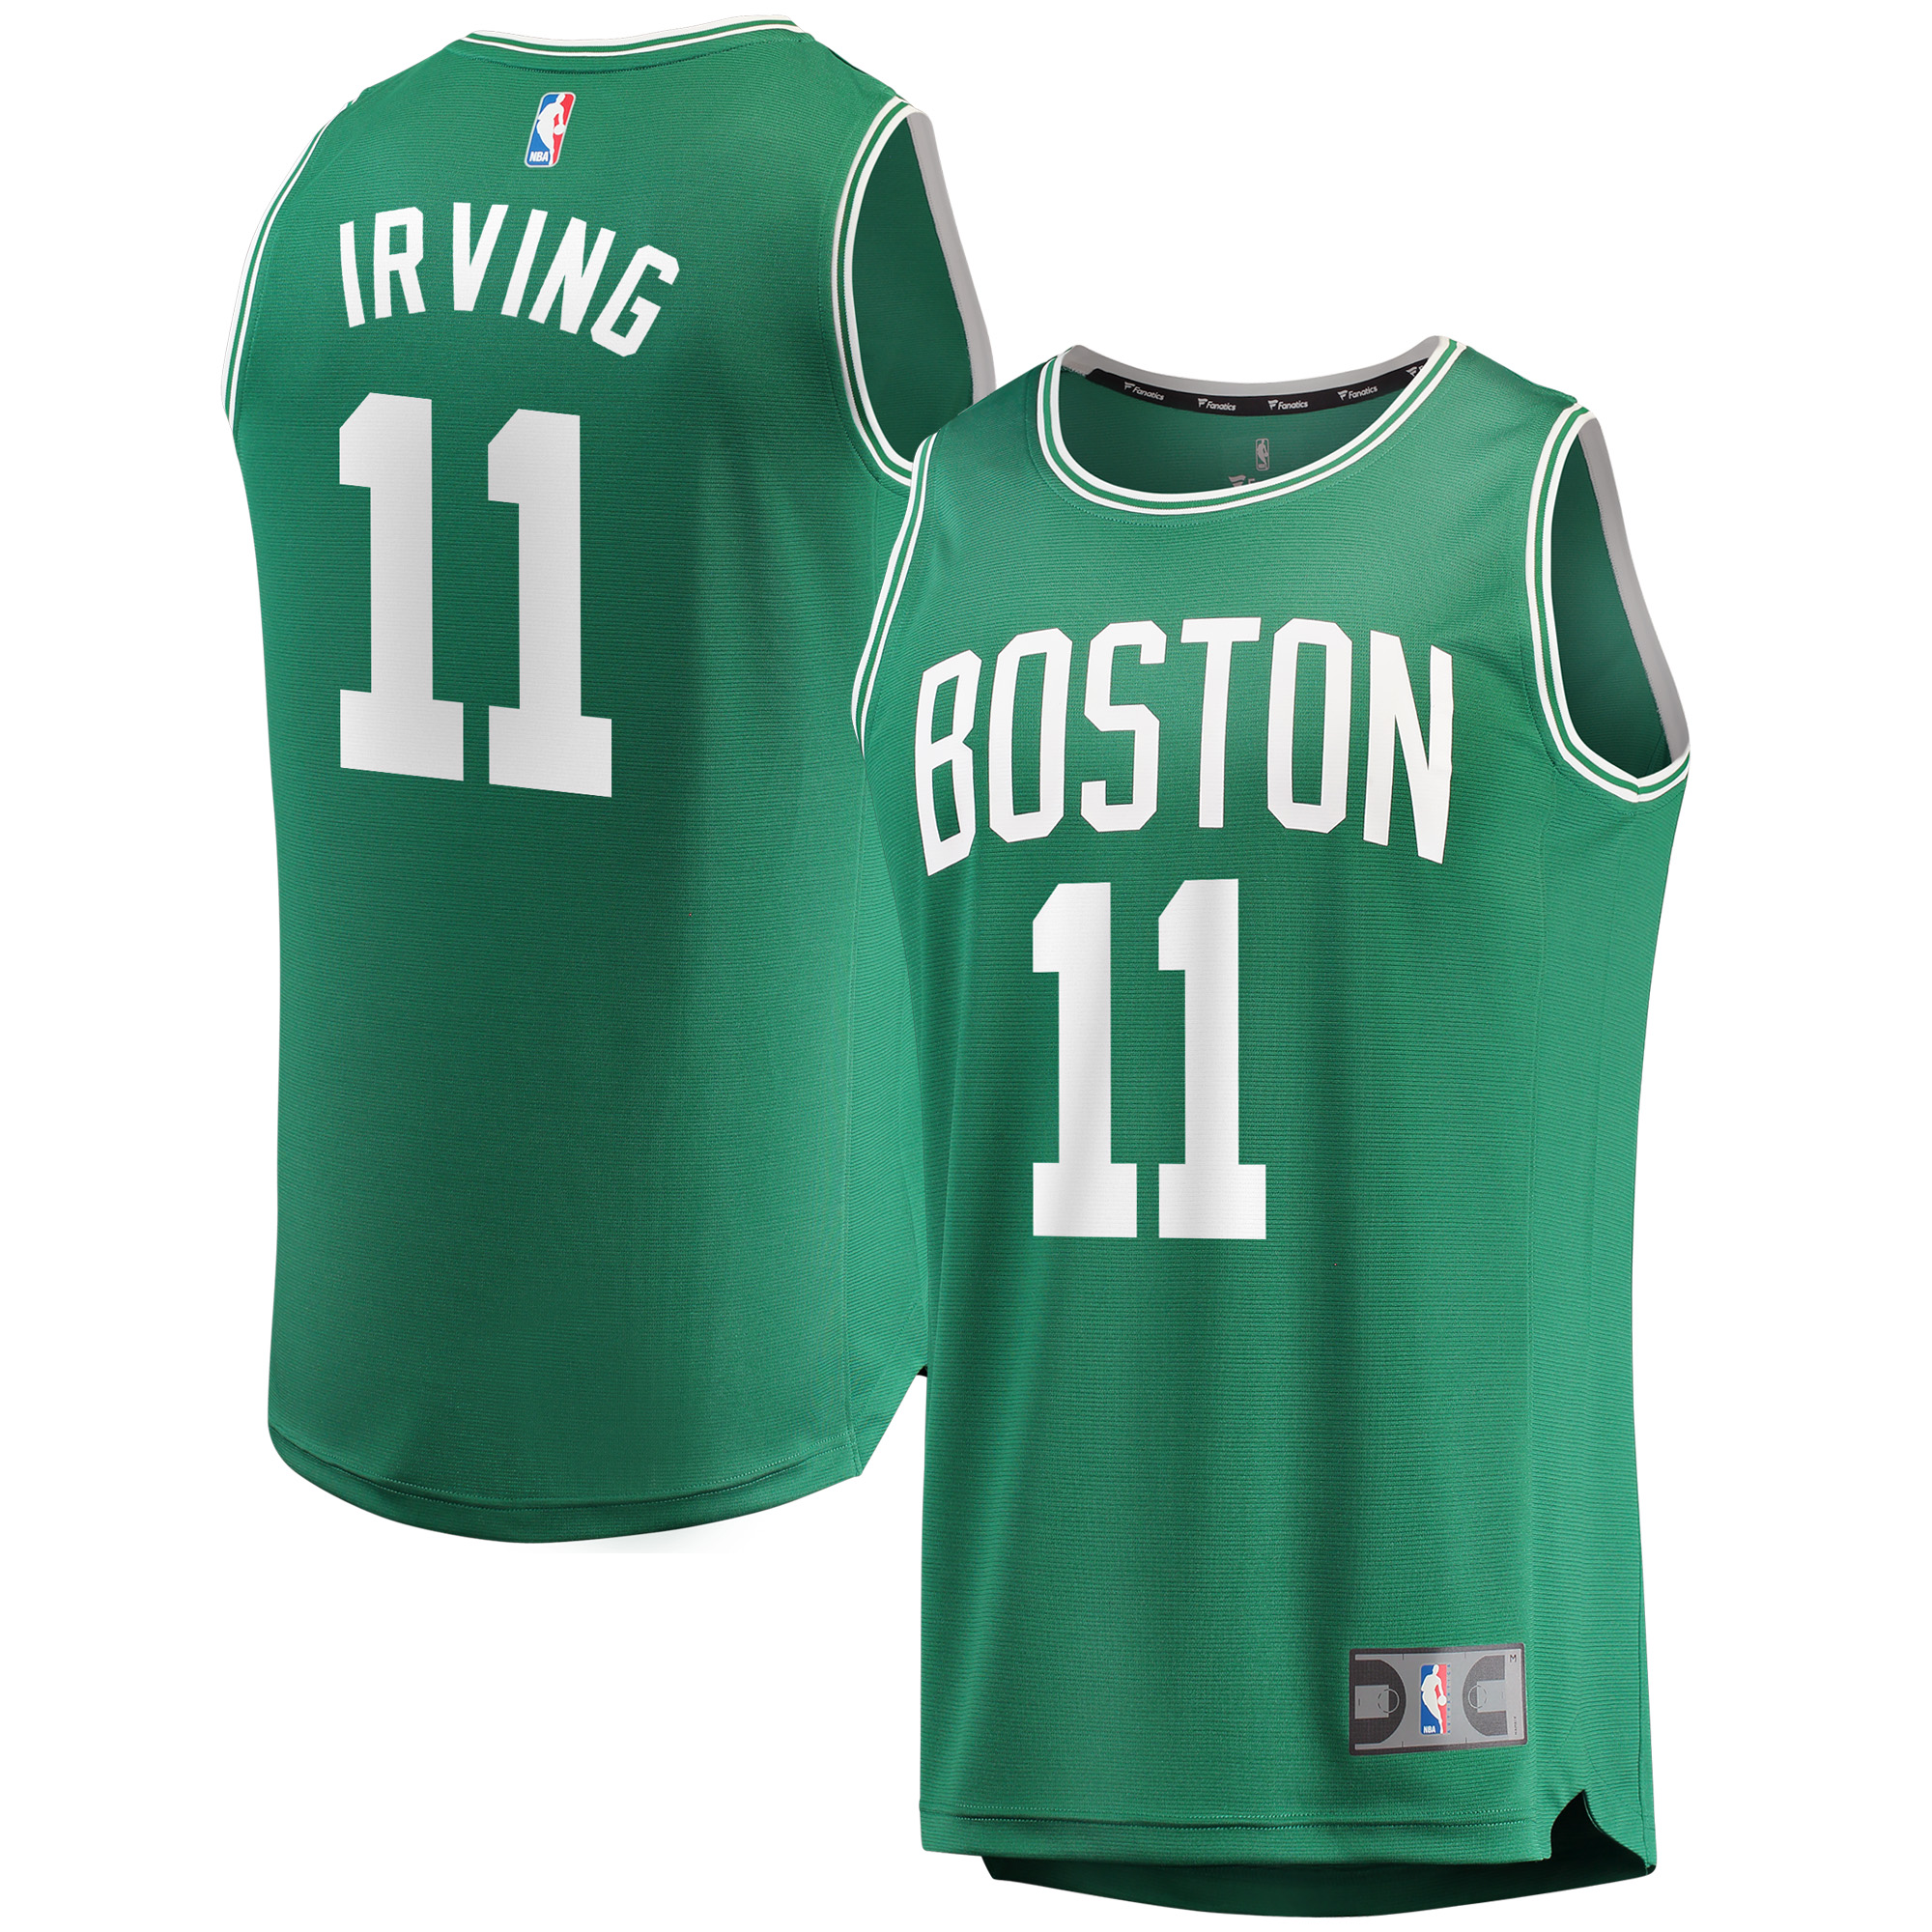 Kyrie Irving Boston Celtics Fanatics Branded Fast Break Replica Player Jersey Kelly Green - Icon Edition